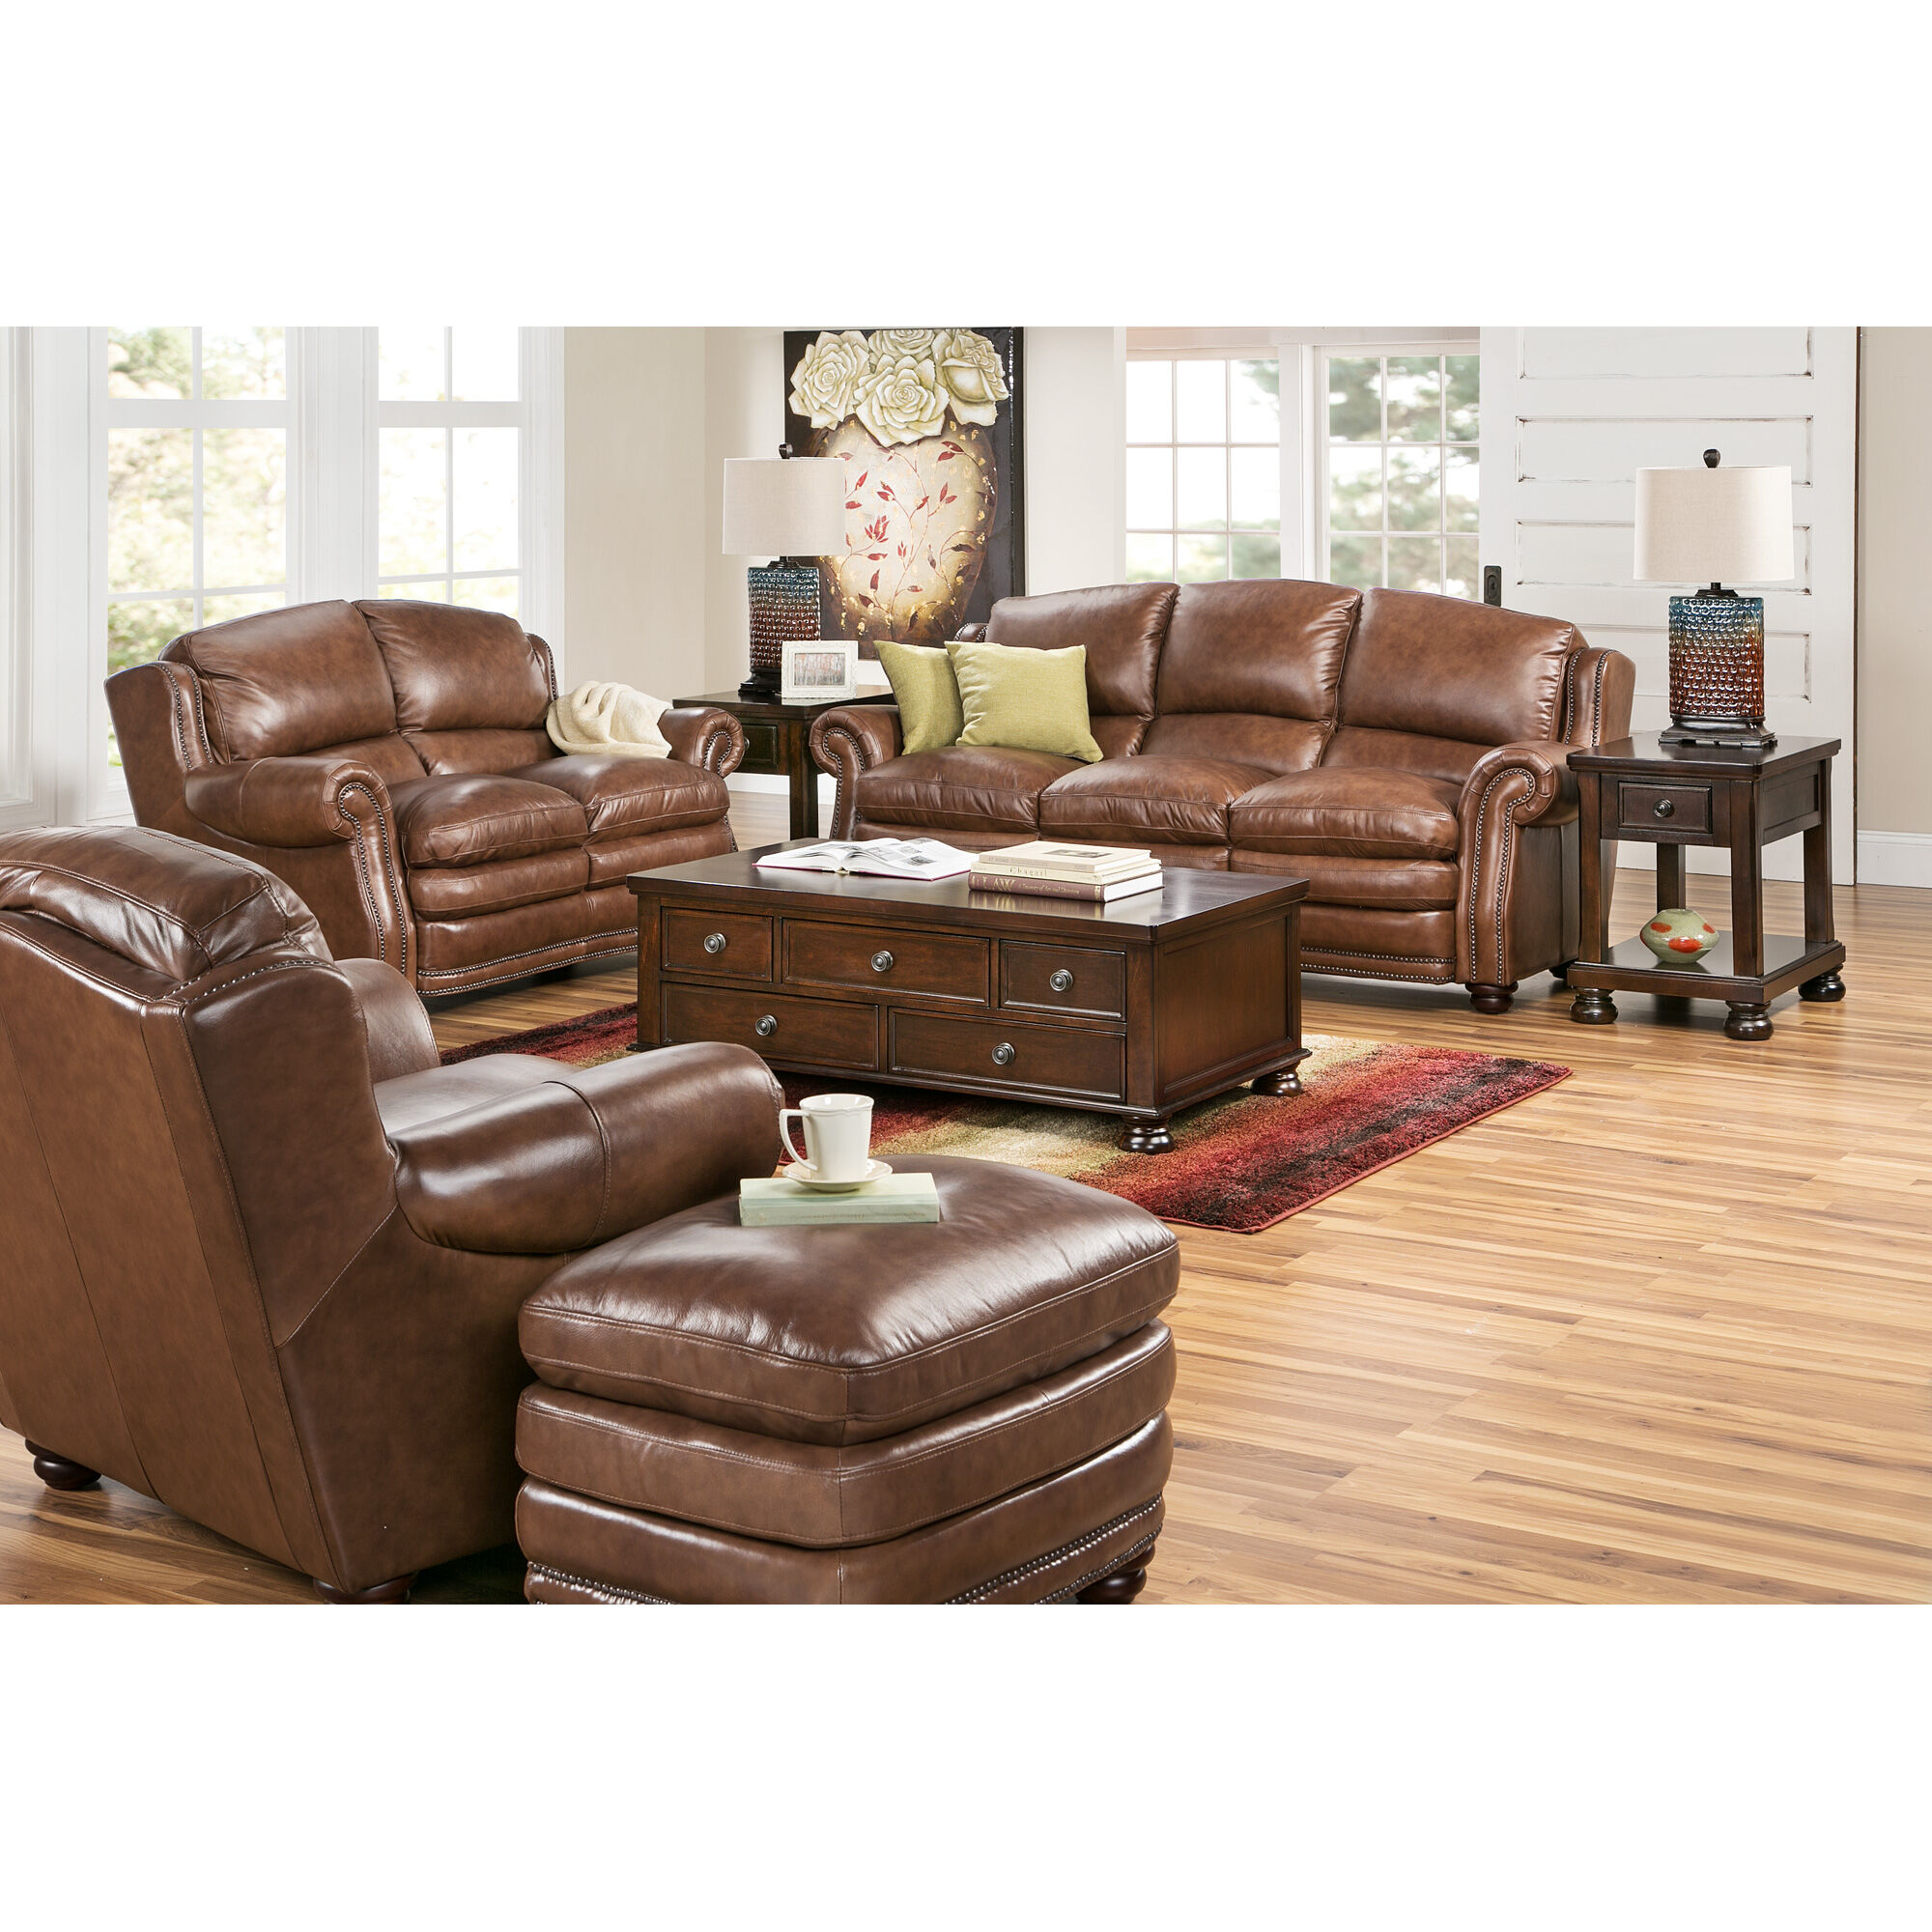 oak furniture land living room sets funky decorating ideas for rooms slumberland | kensington sofa